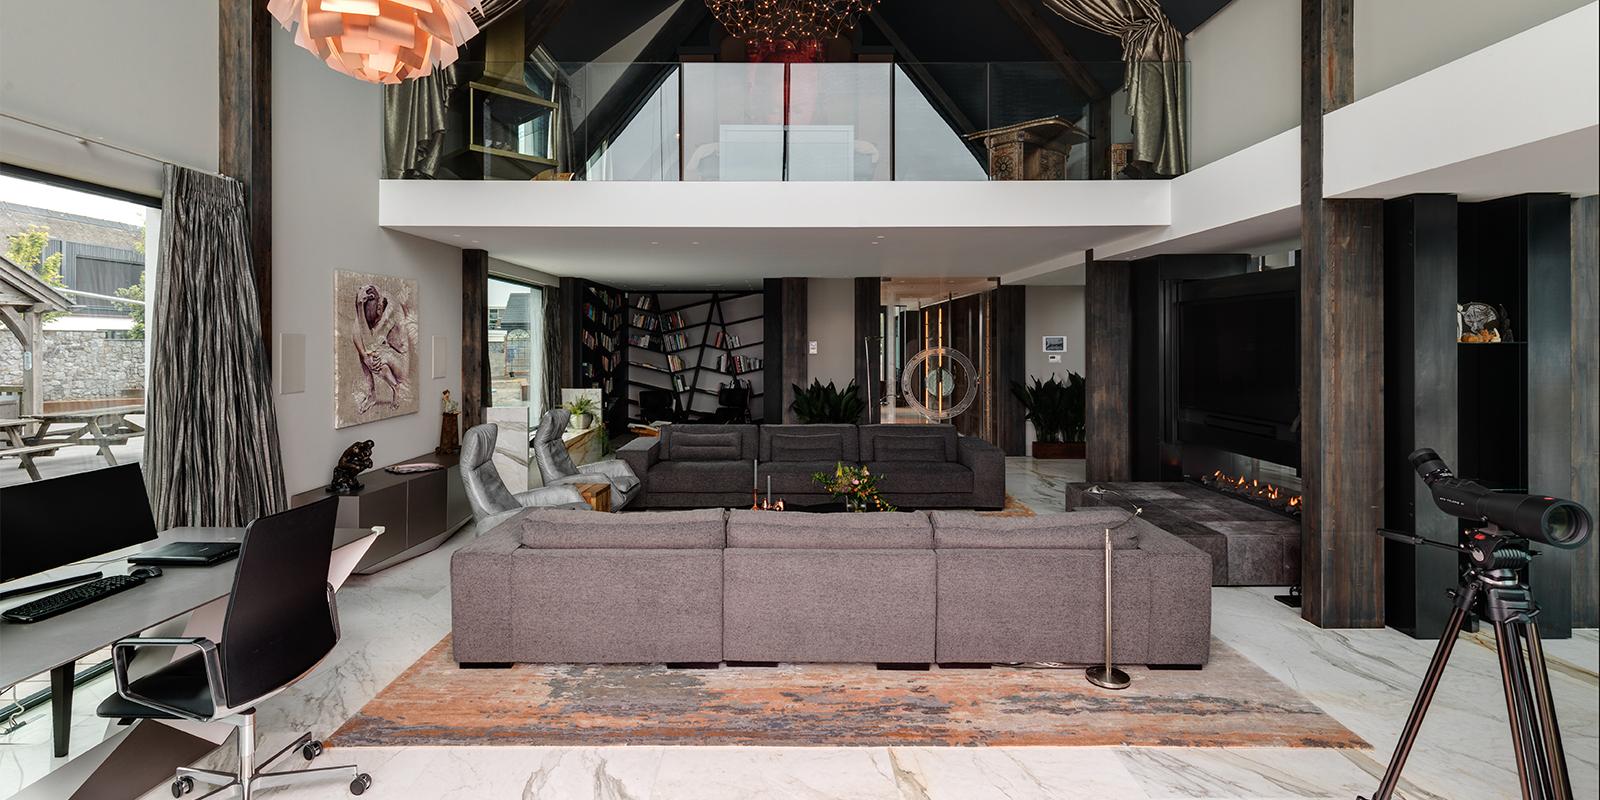 SfeervolInterieur | Boley, the art of living